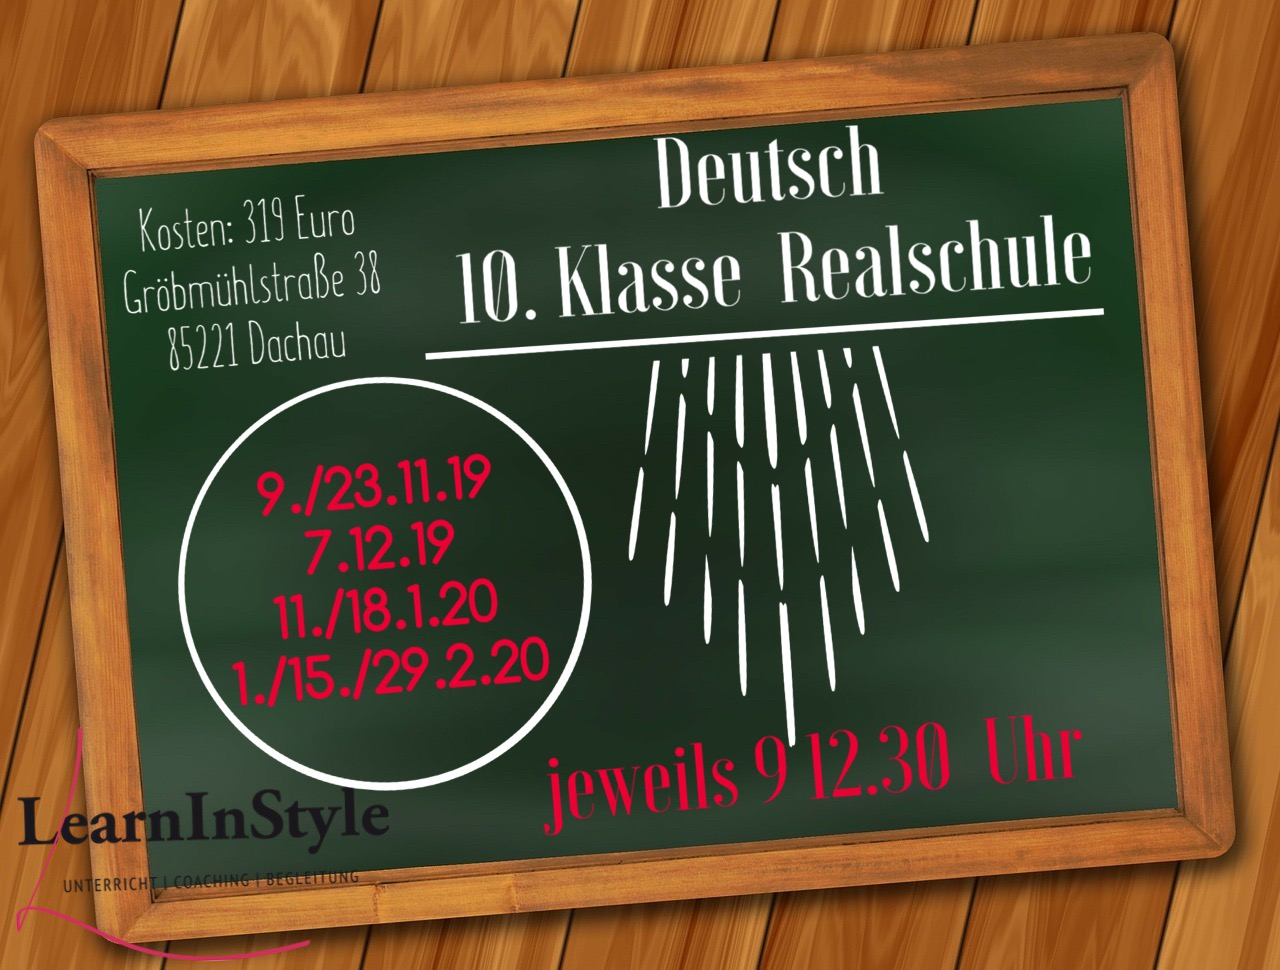 Deutsch 10. Klasse Realschule